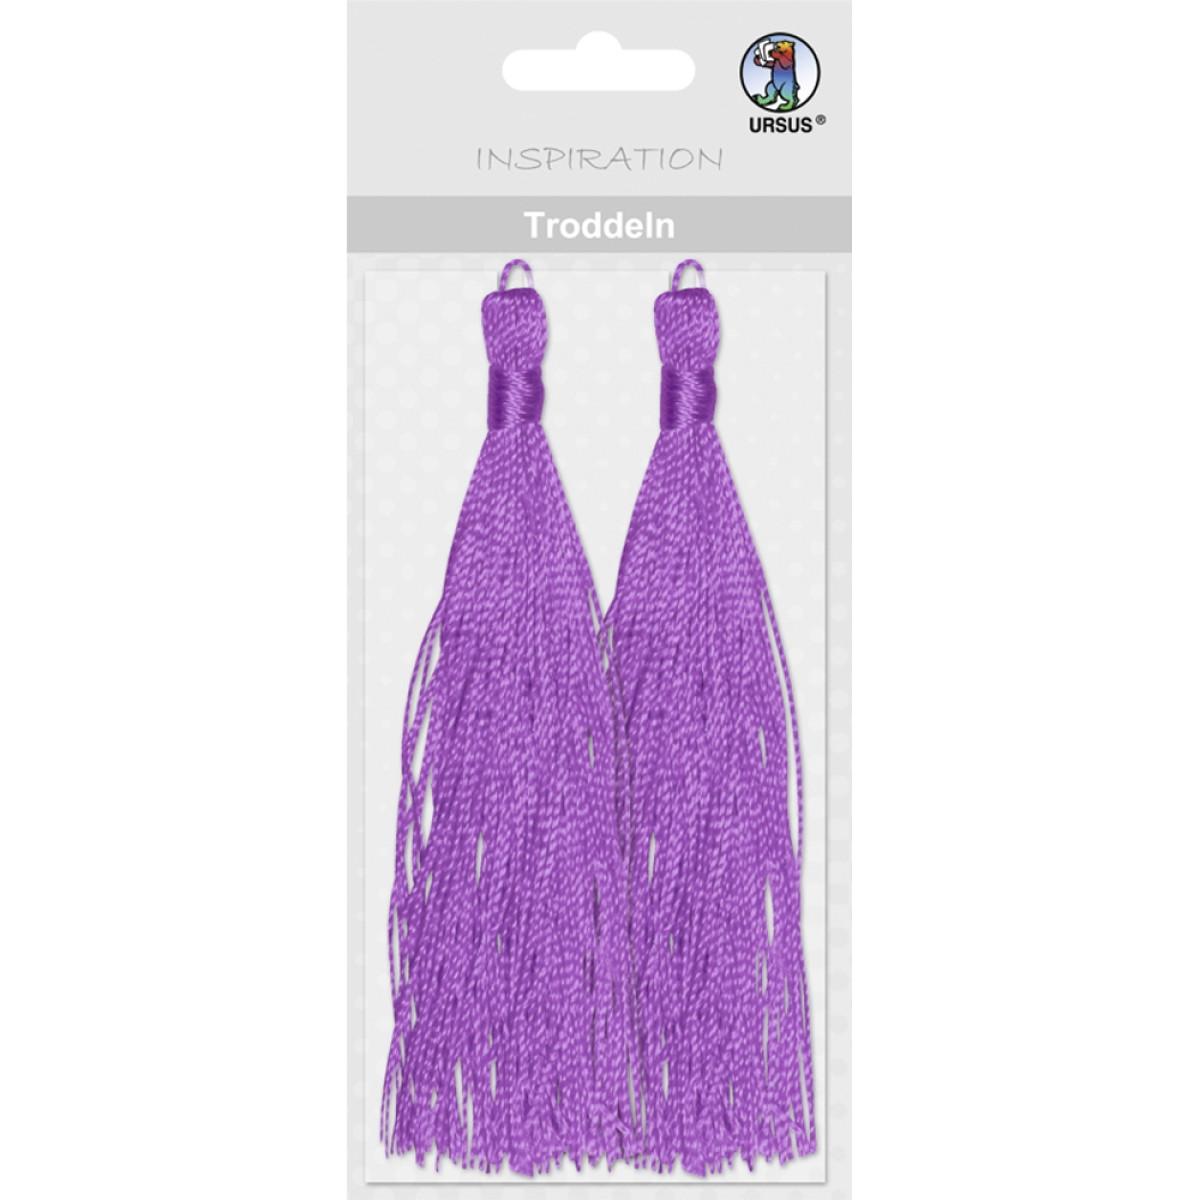 Troddeln mit Kordeln violett